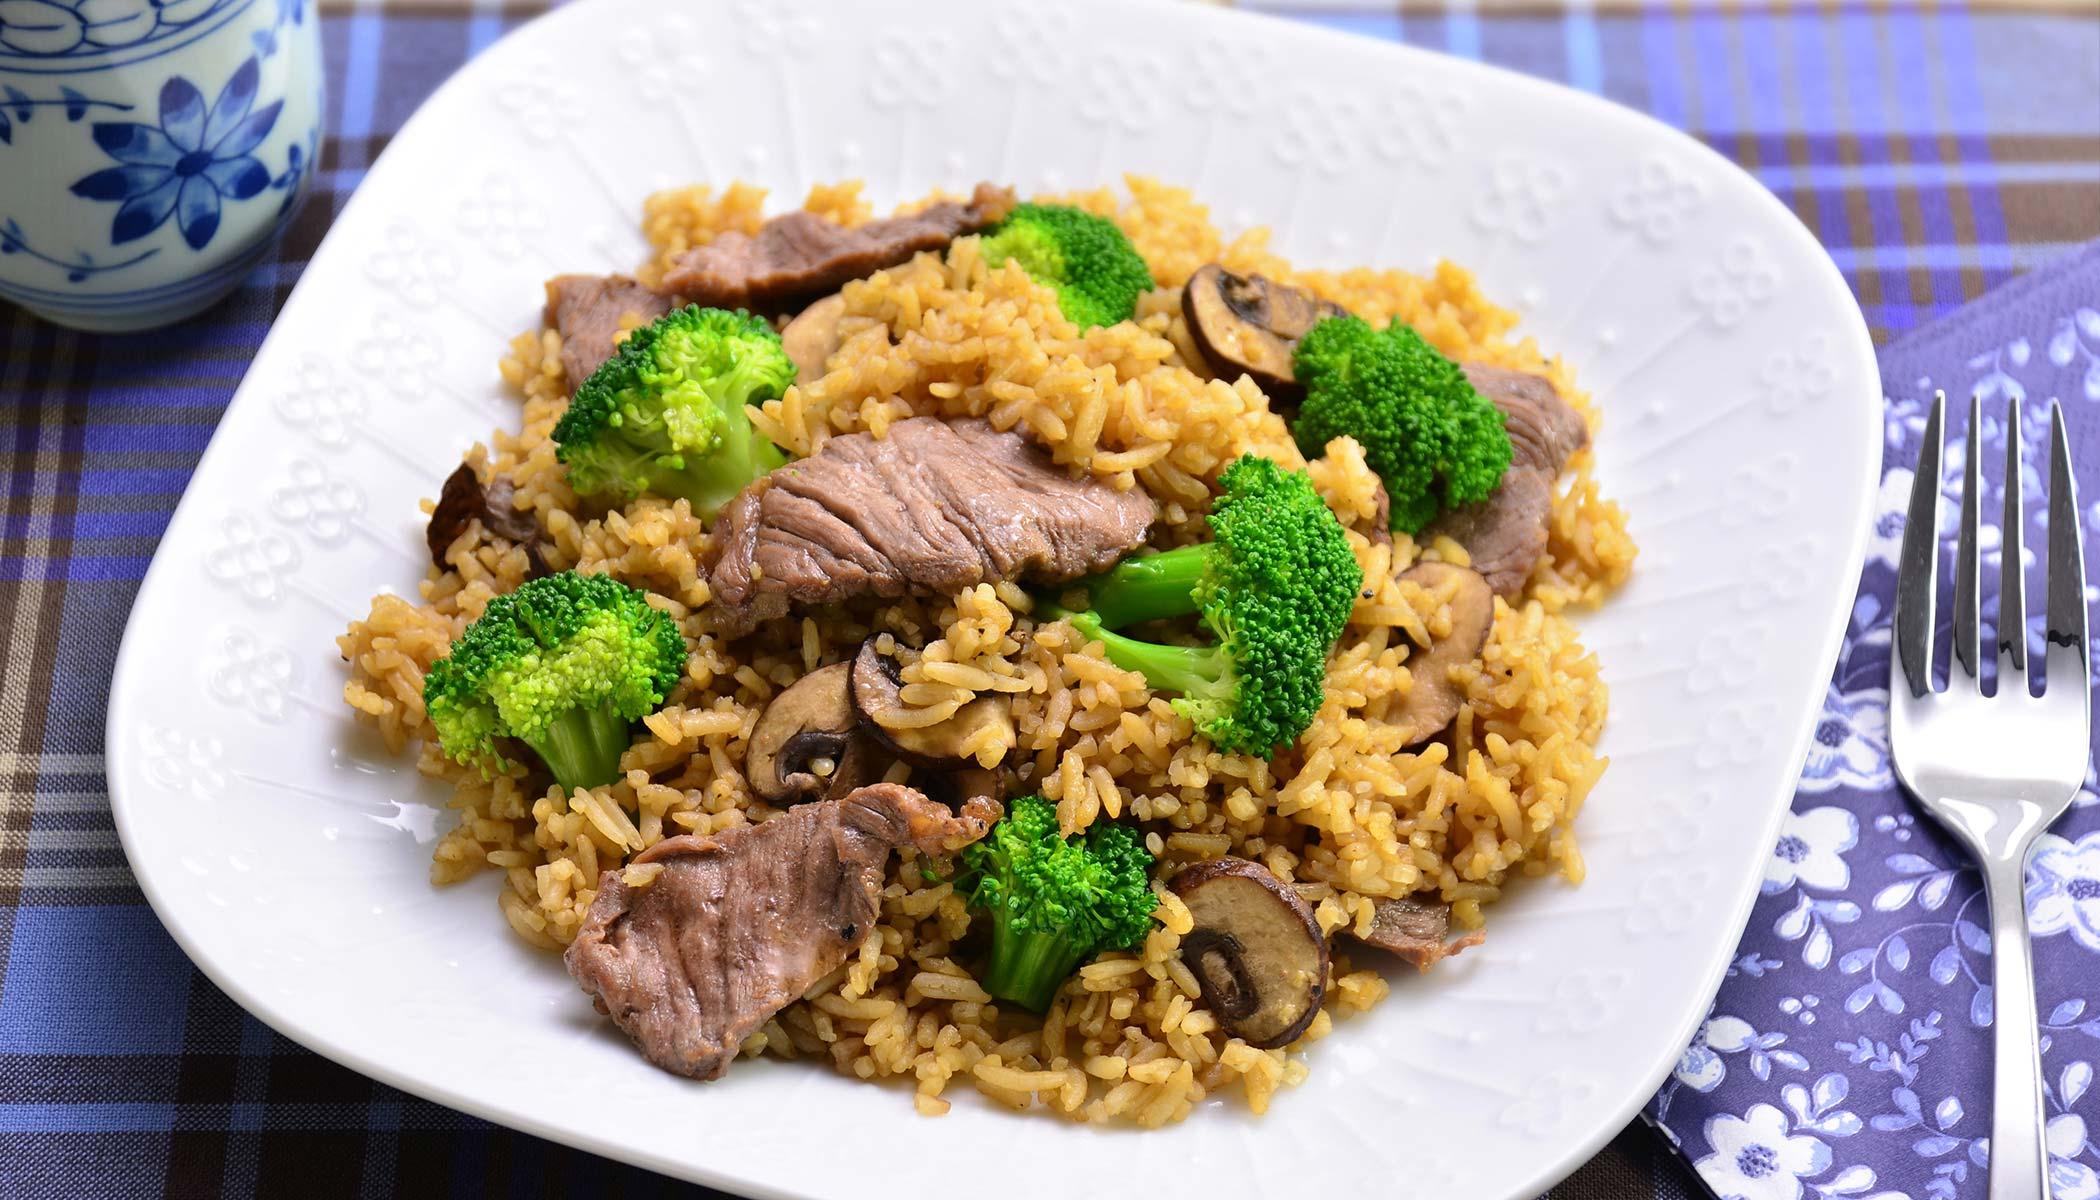 Portabella Mushroom Rice with Beef and Broccoli